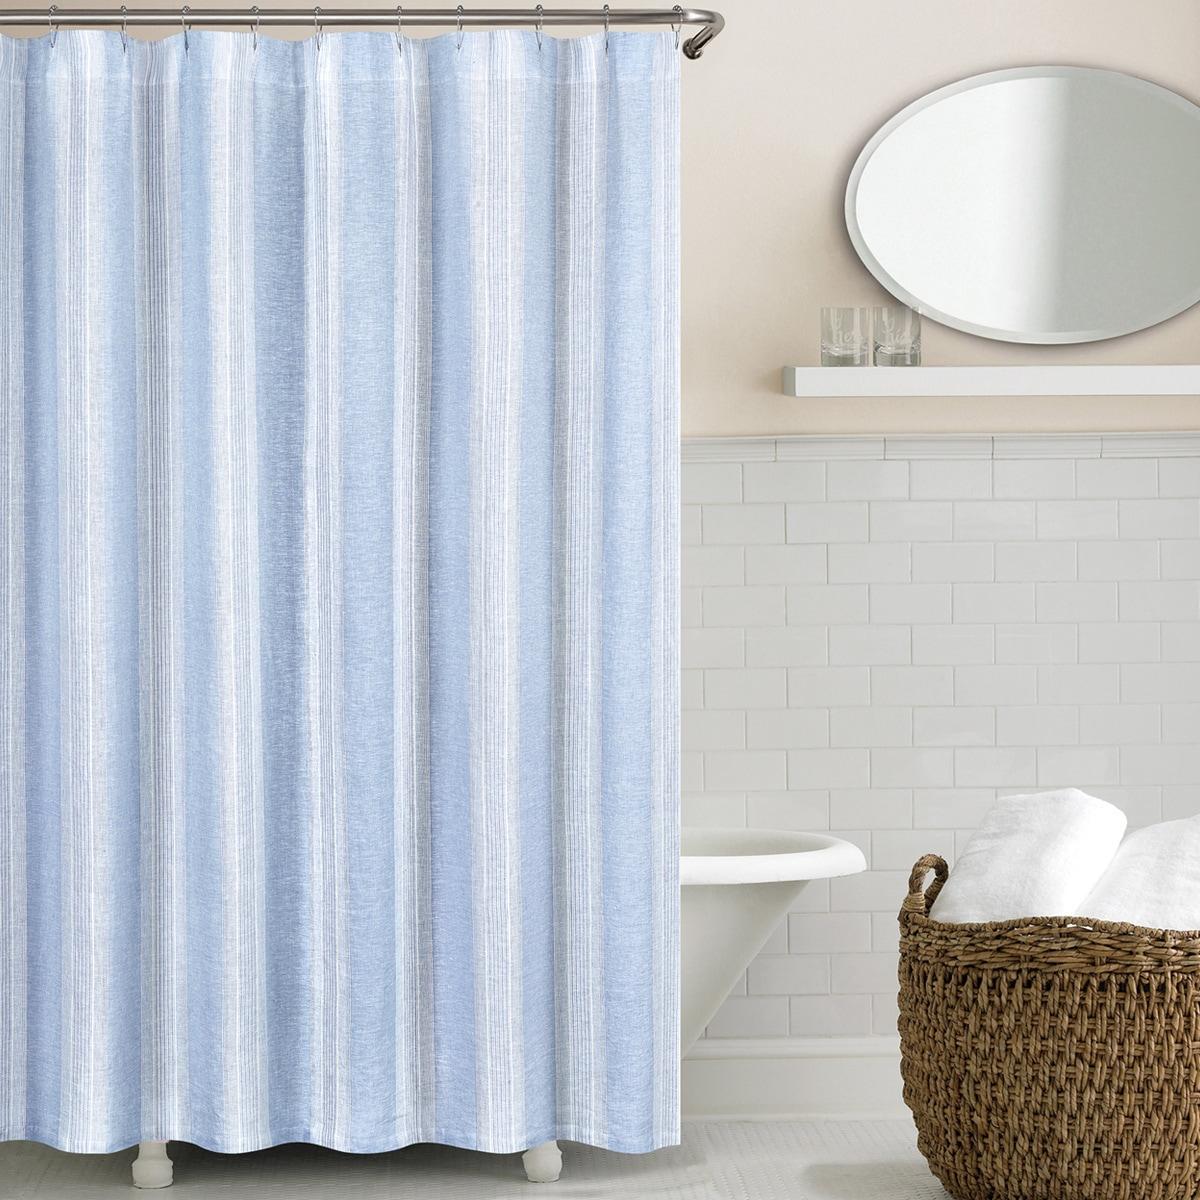 Vintage Stripe Washed Belgian Linen Shower Curtain - Free Shipping ...